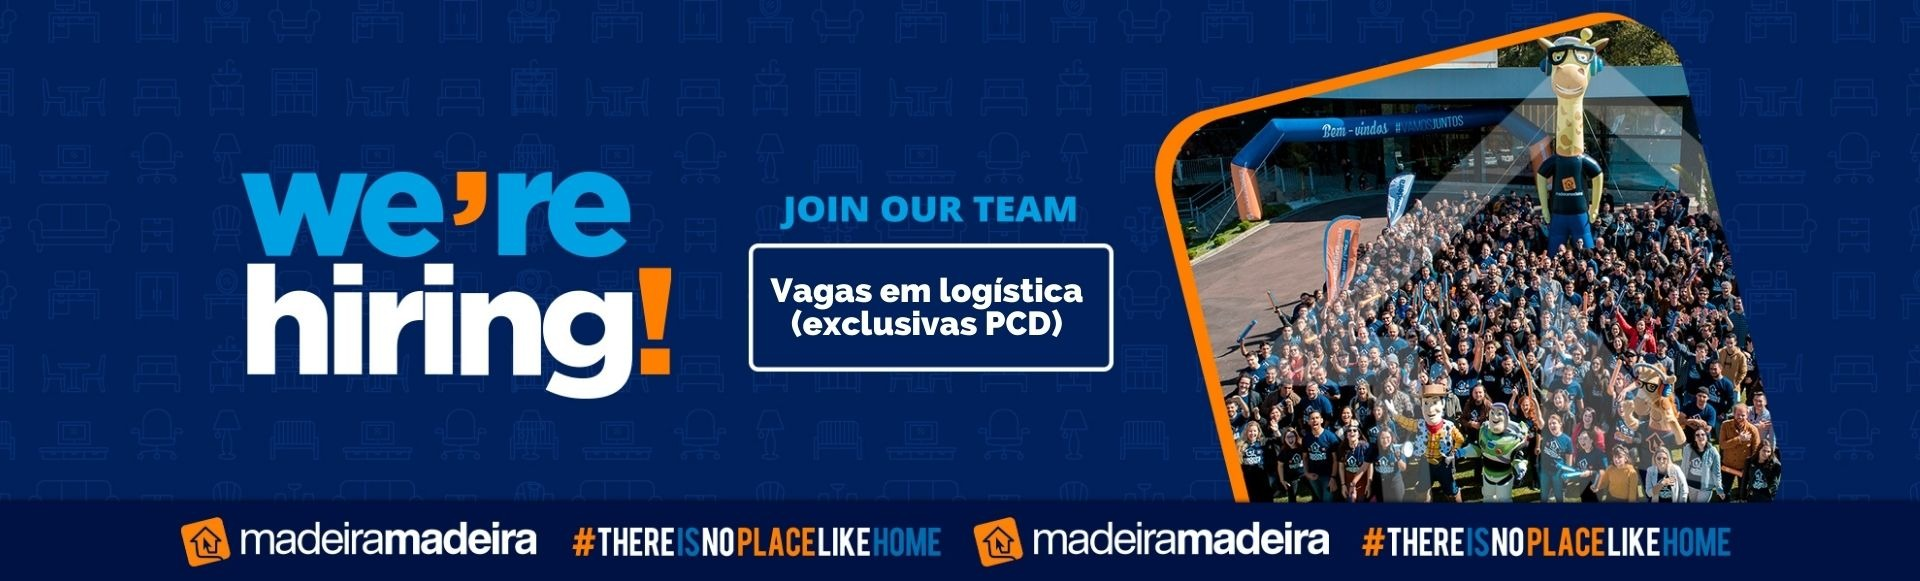 Vagas em logística - exclusivas PCD (Curitiba-PR)